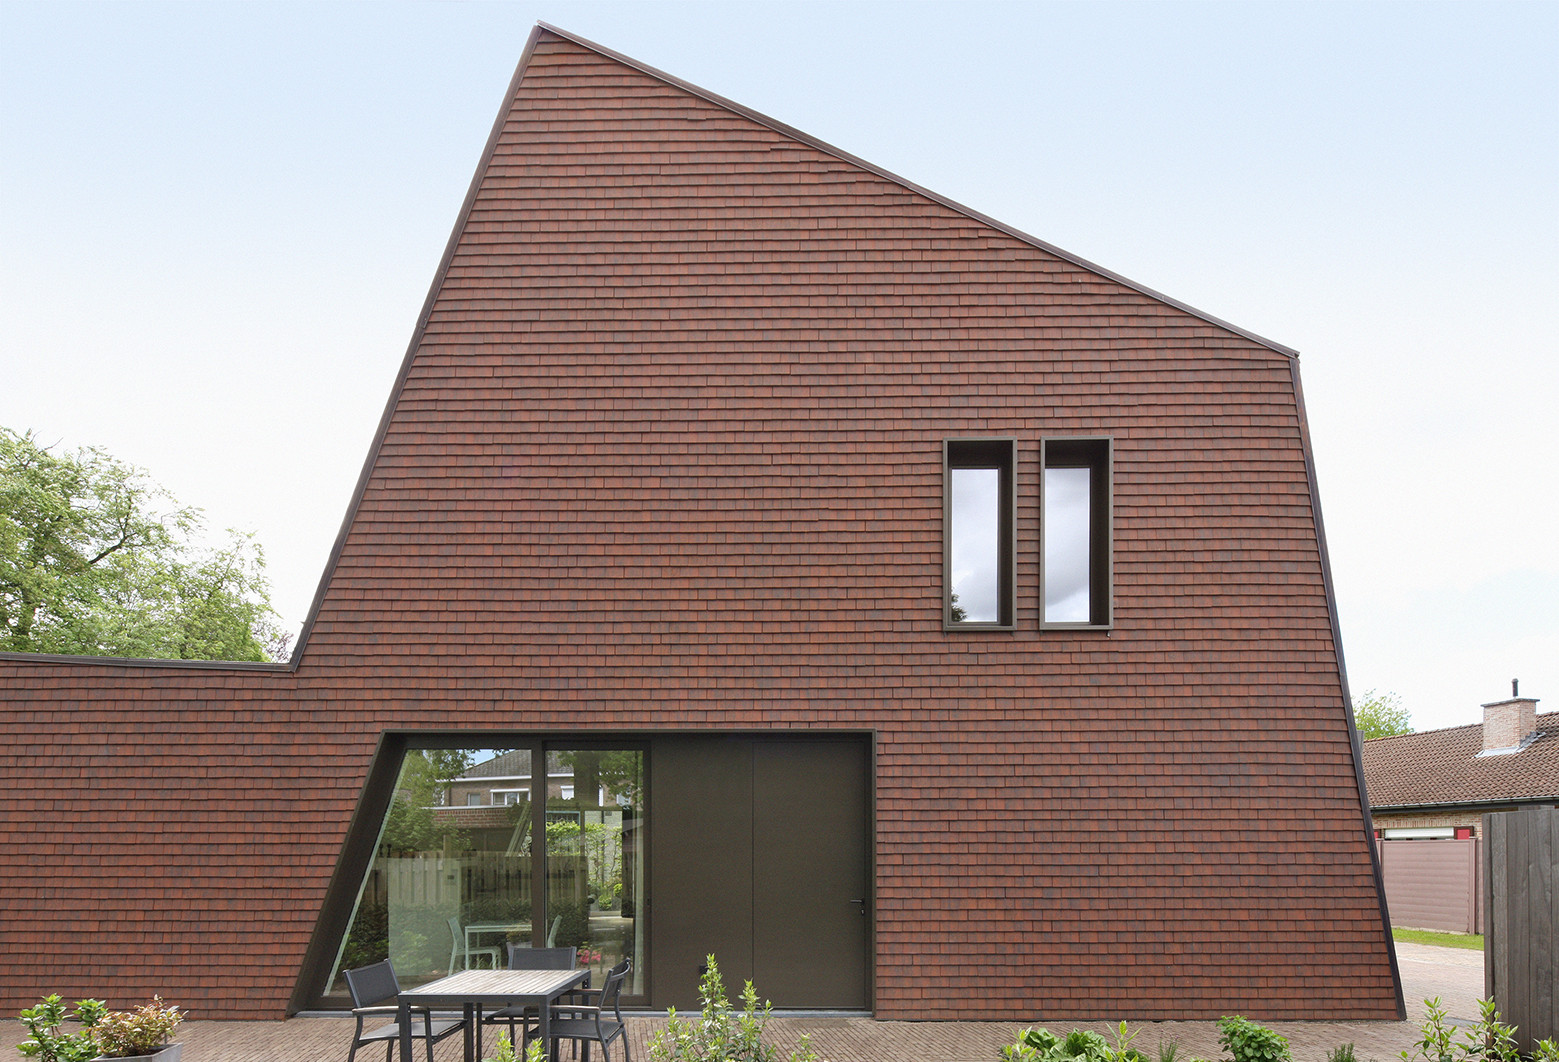 Villa Willemsdorp / Dieter De Vos Architecten - Plataforma Arquitectura